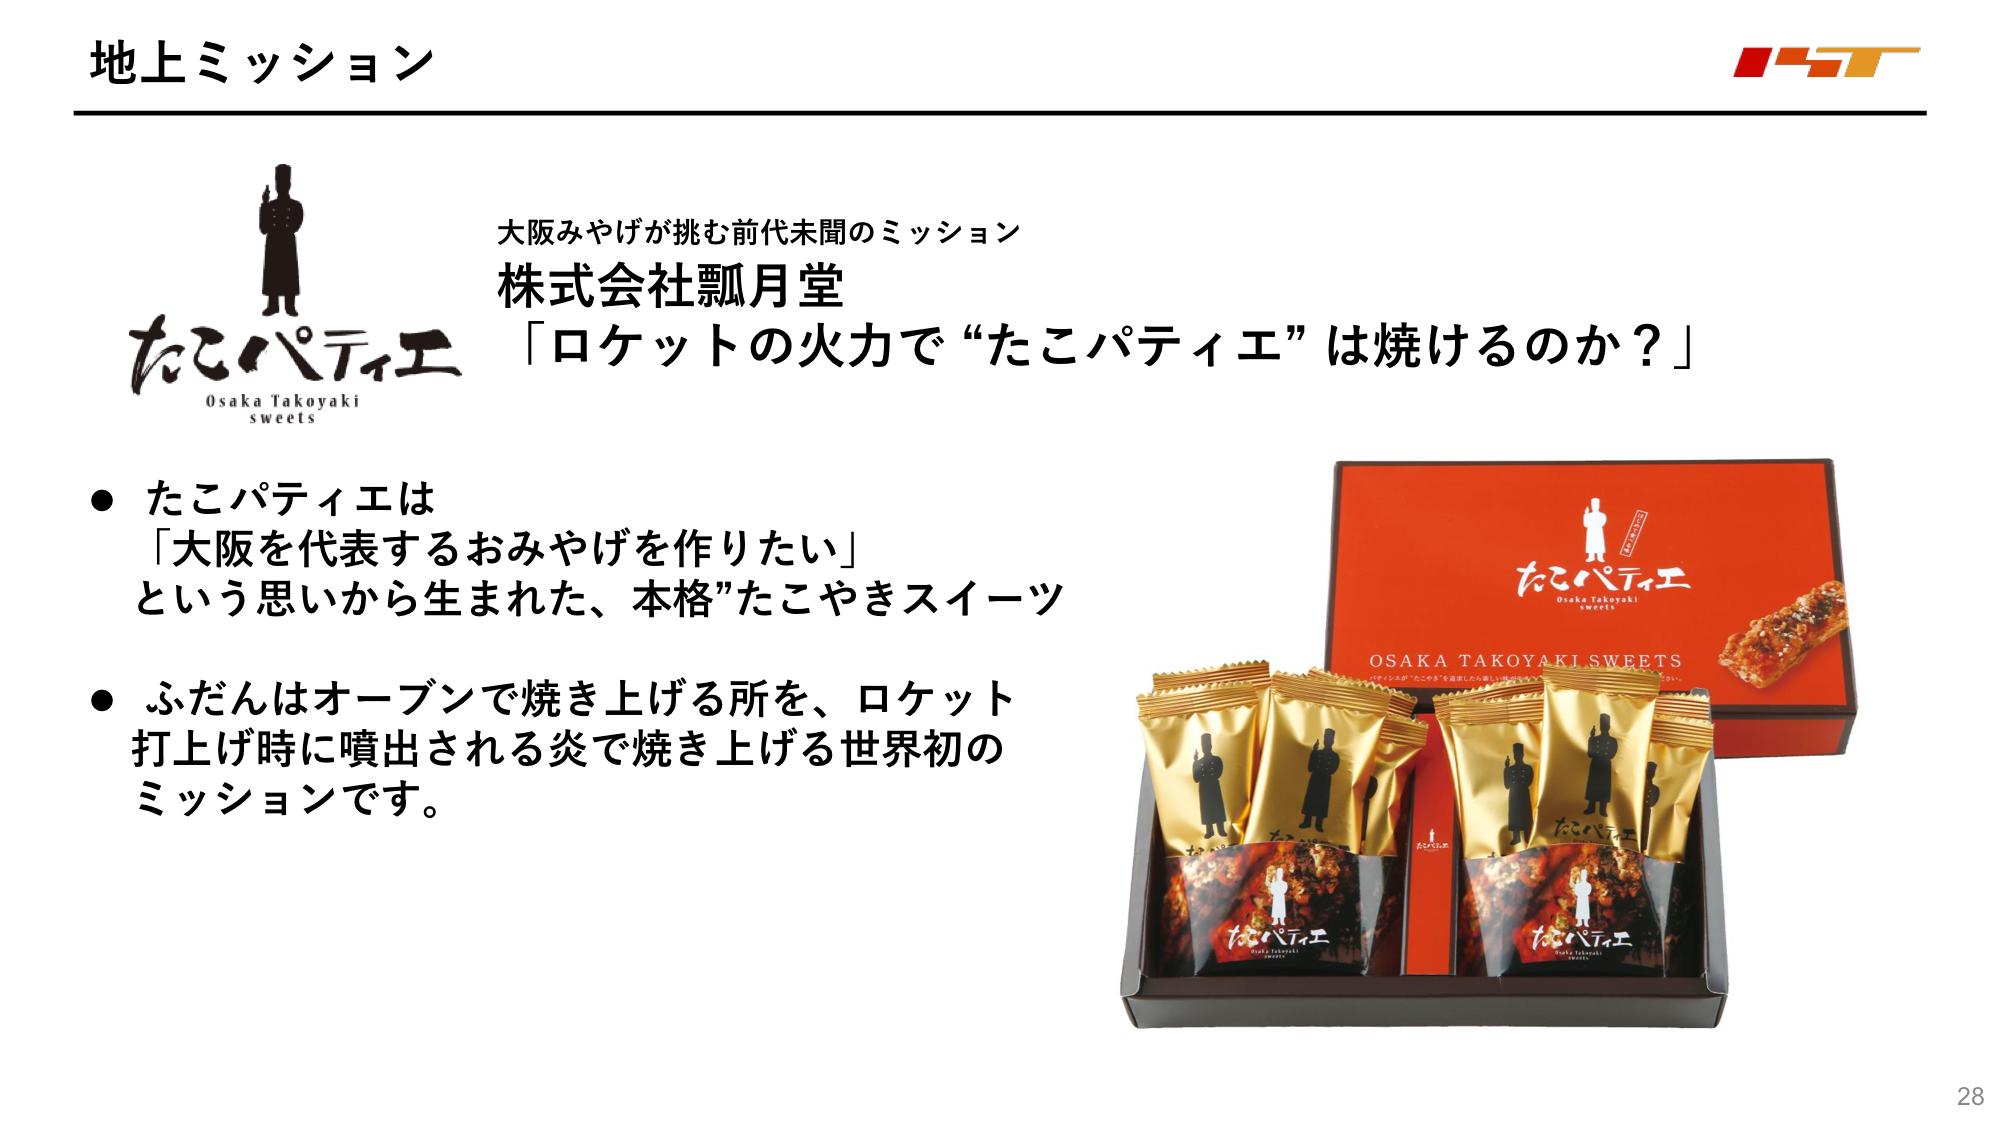 f:id:Imamura:20191126135256p:plain